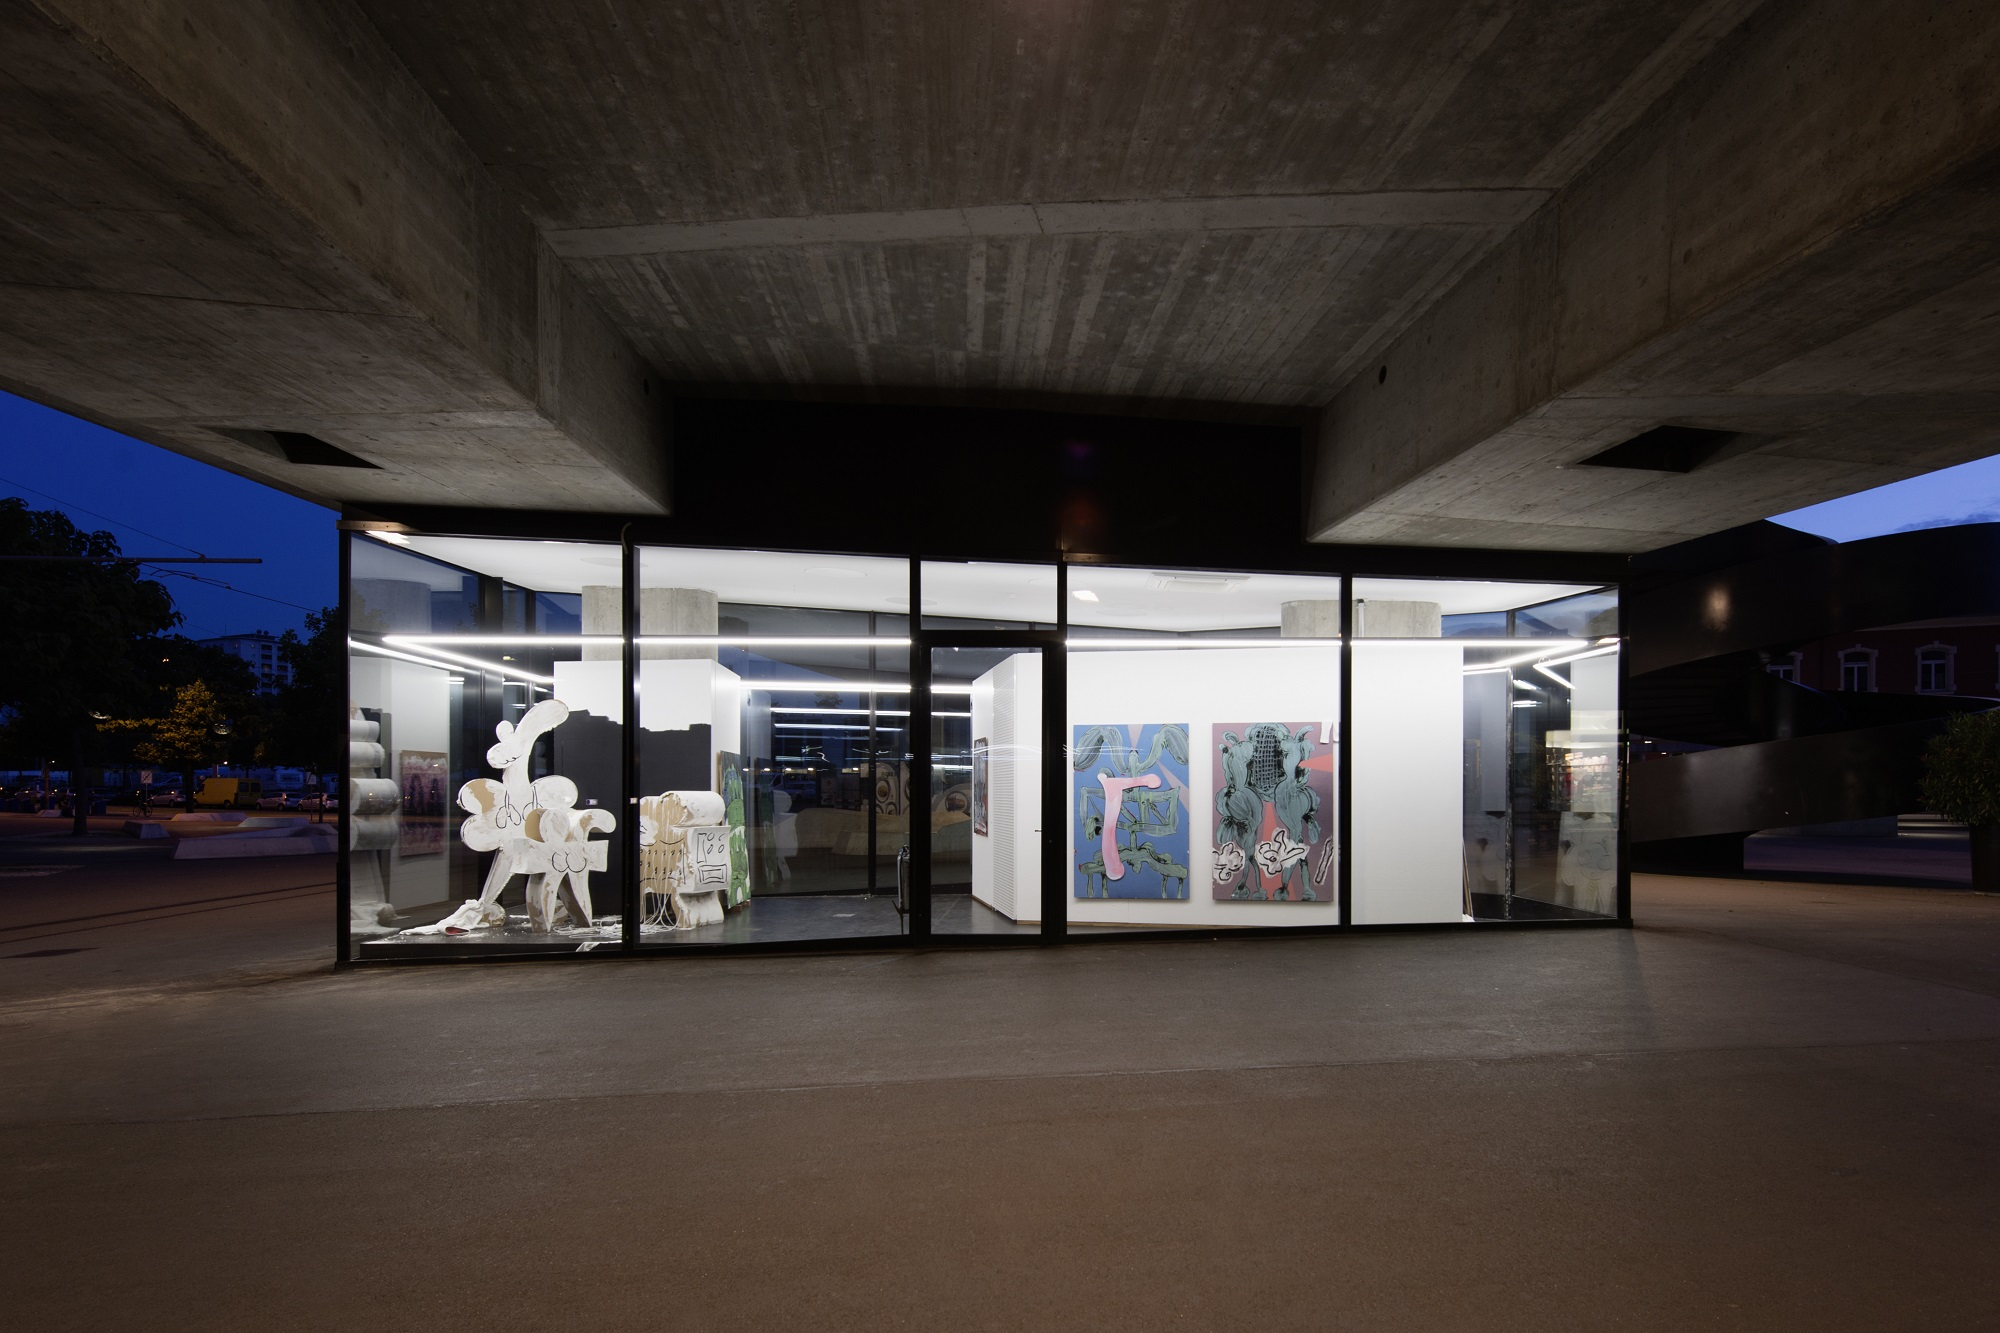 Image Credit: Edwin Burdis, AutoLaque, 2016, Installation view, VITRINE, Basel. Courtesy VITRINE. Photographer Nici Jost.